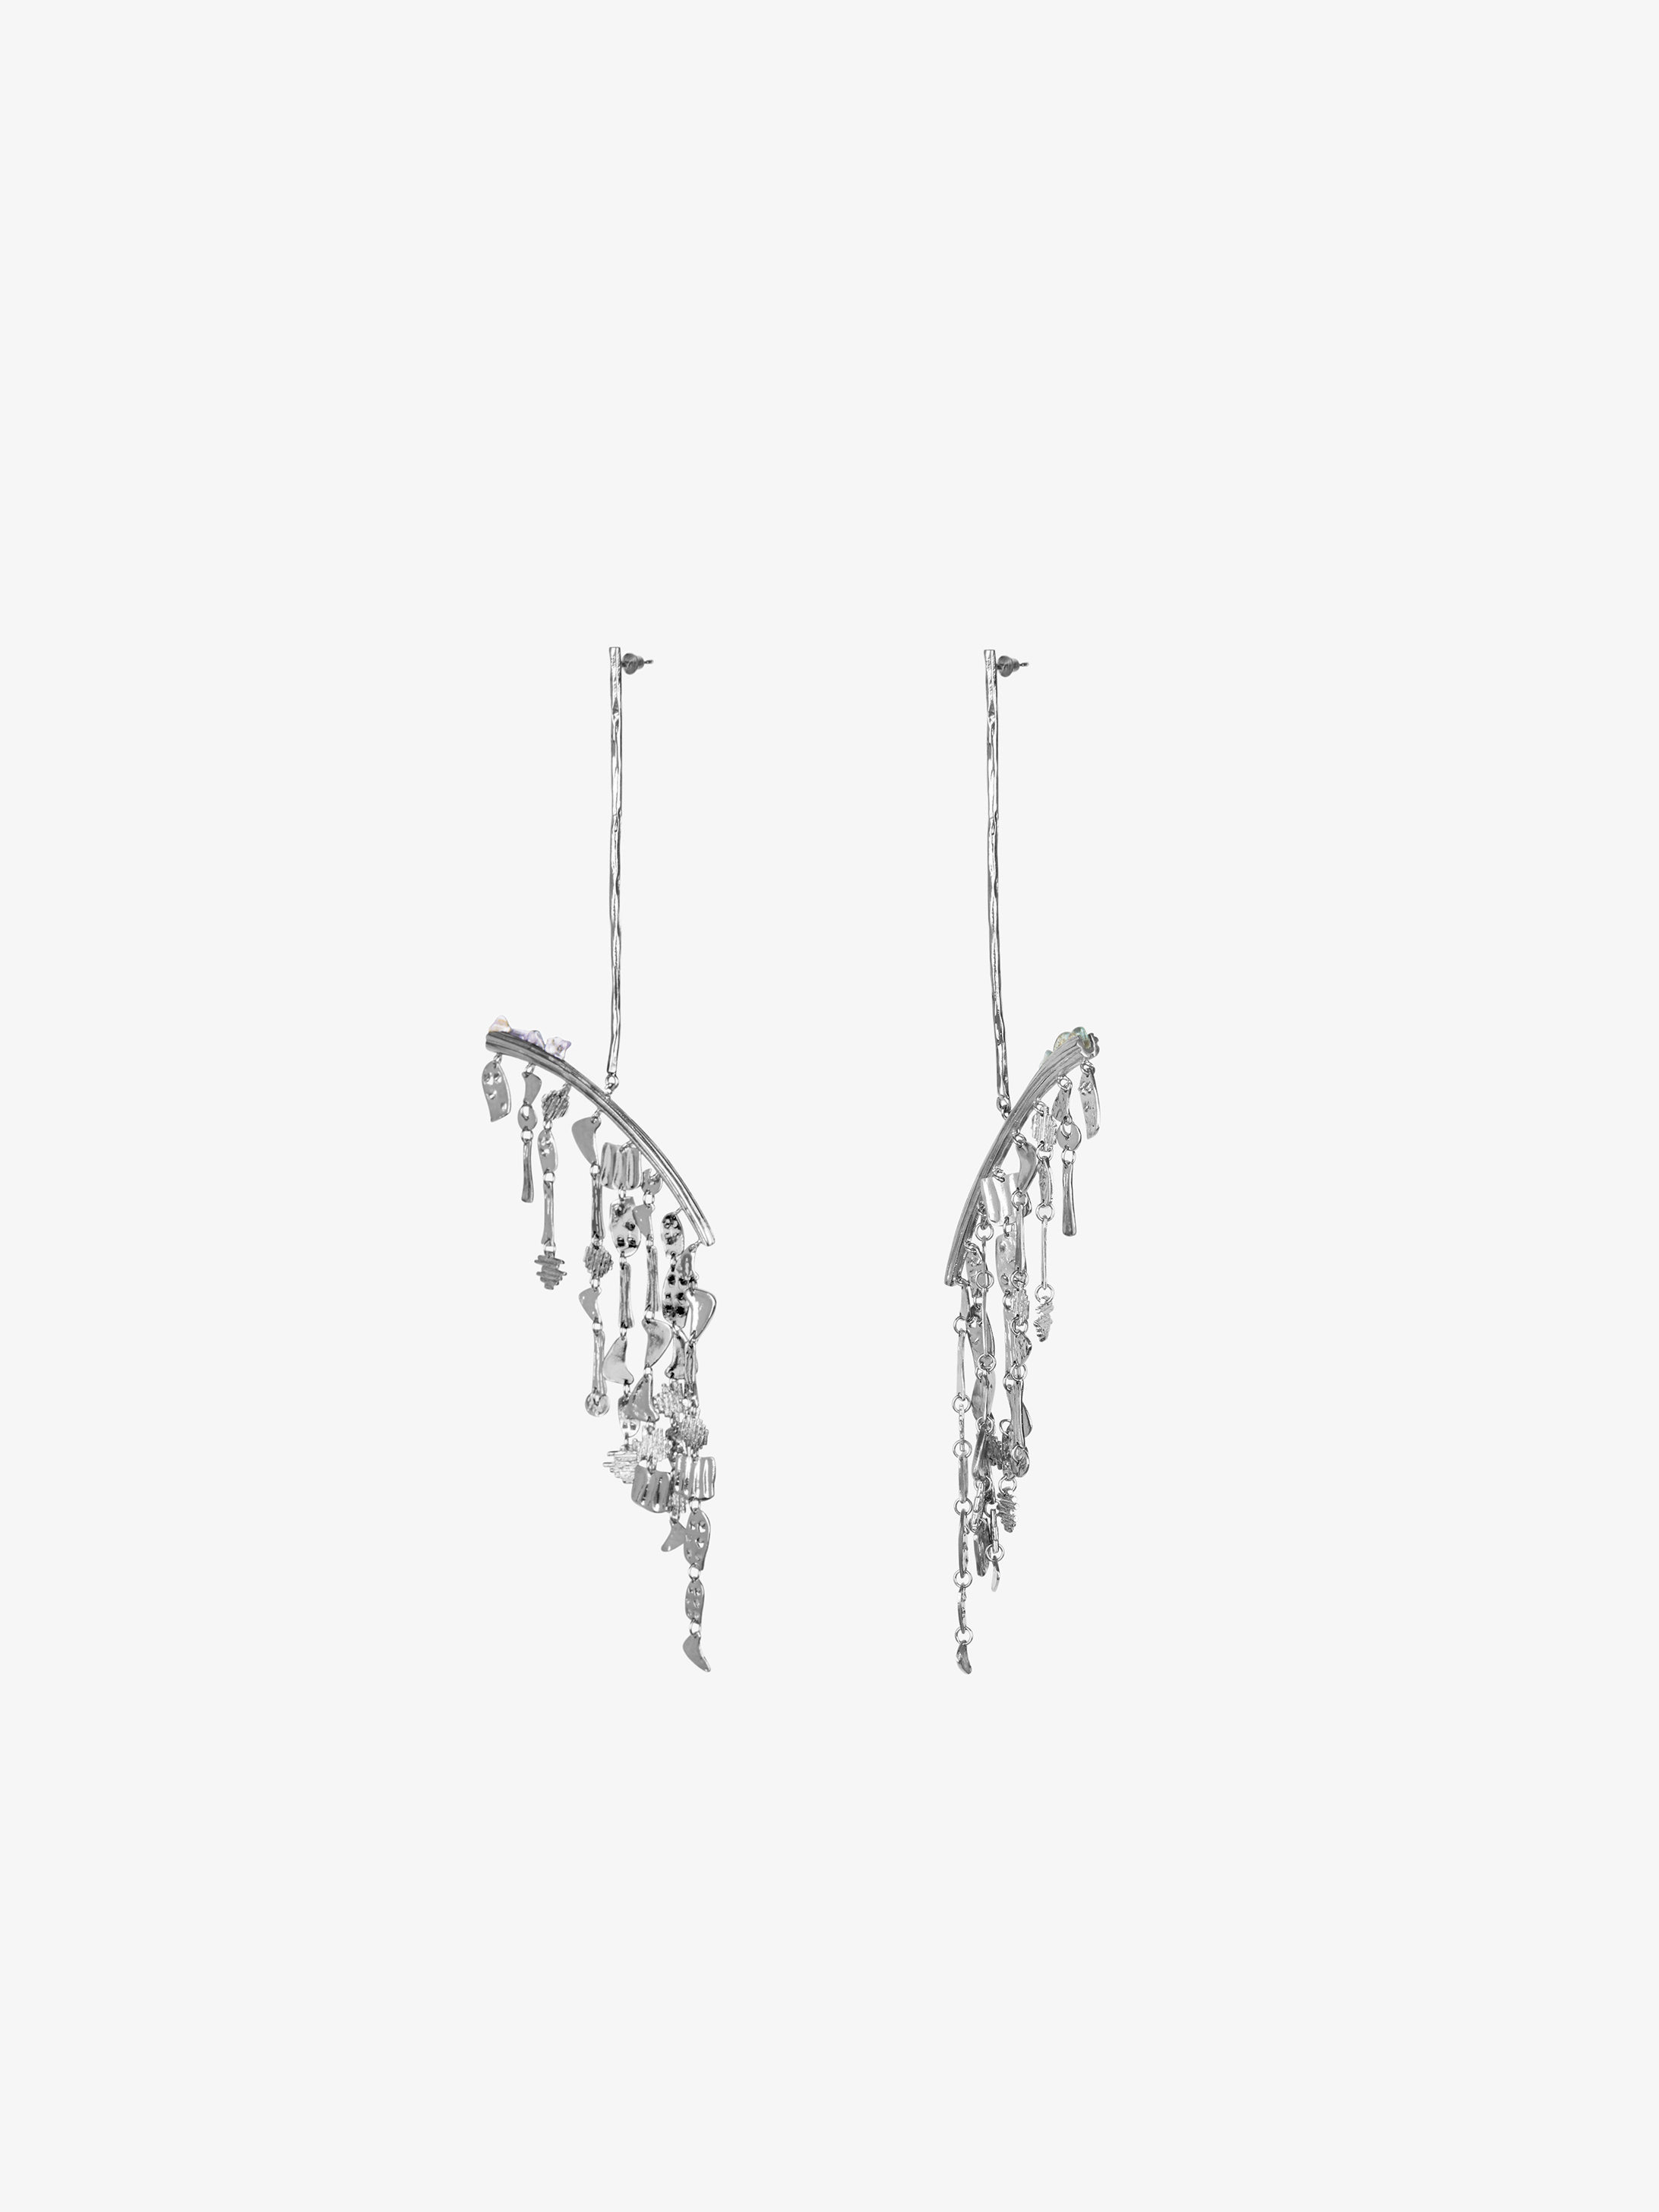 Pendant earrings in smoked quartz